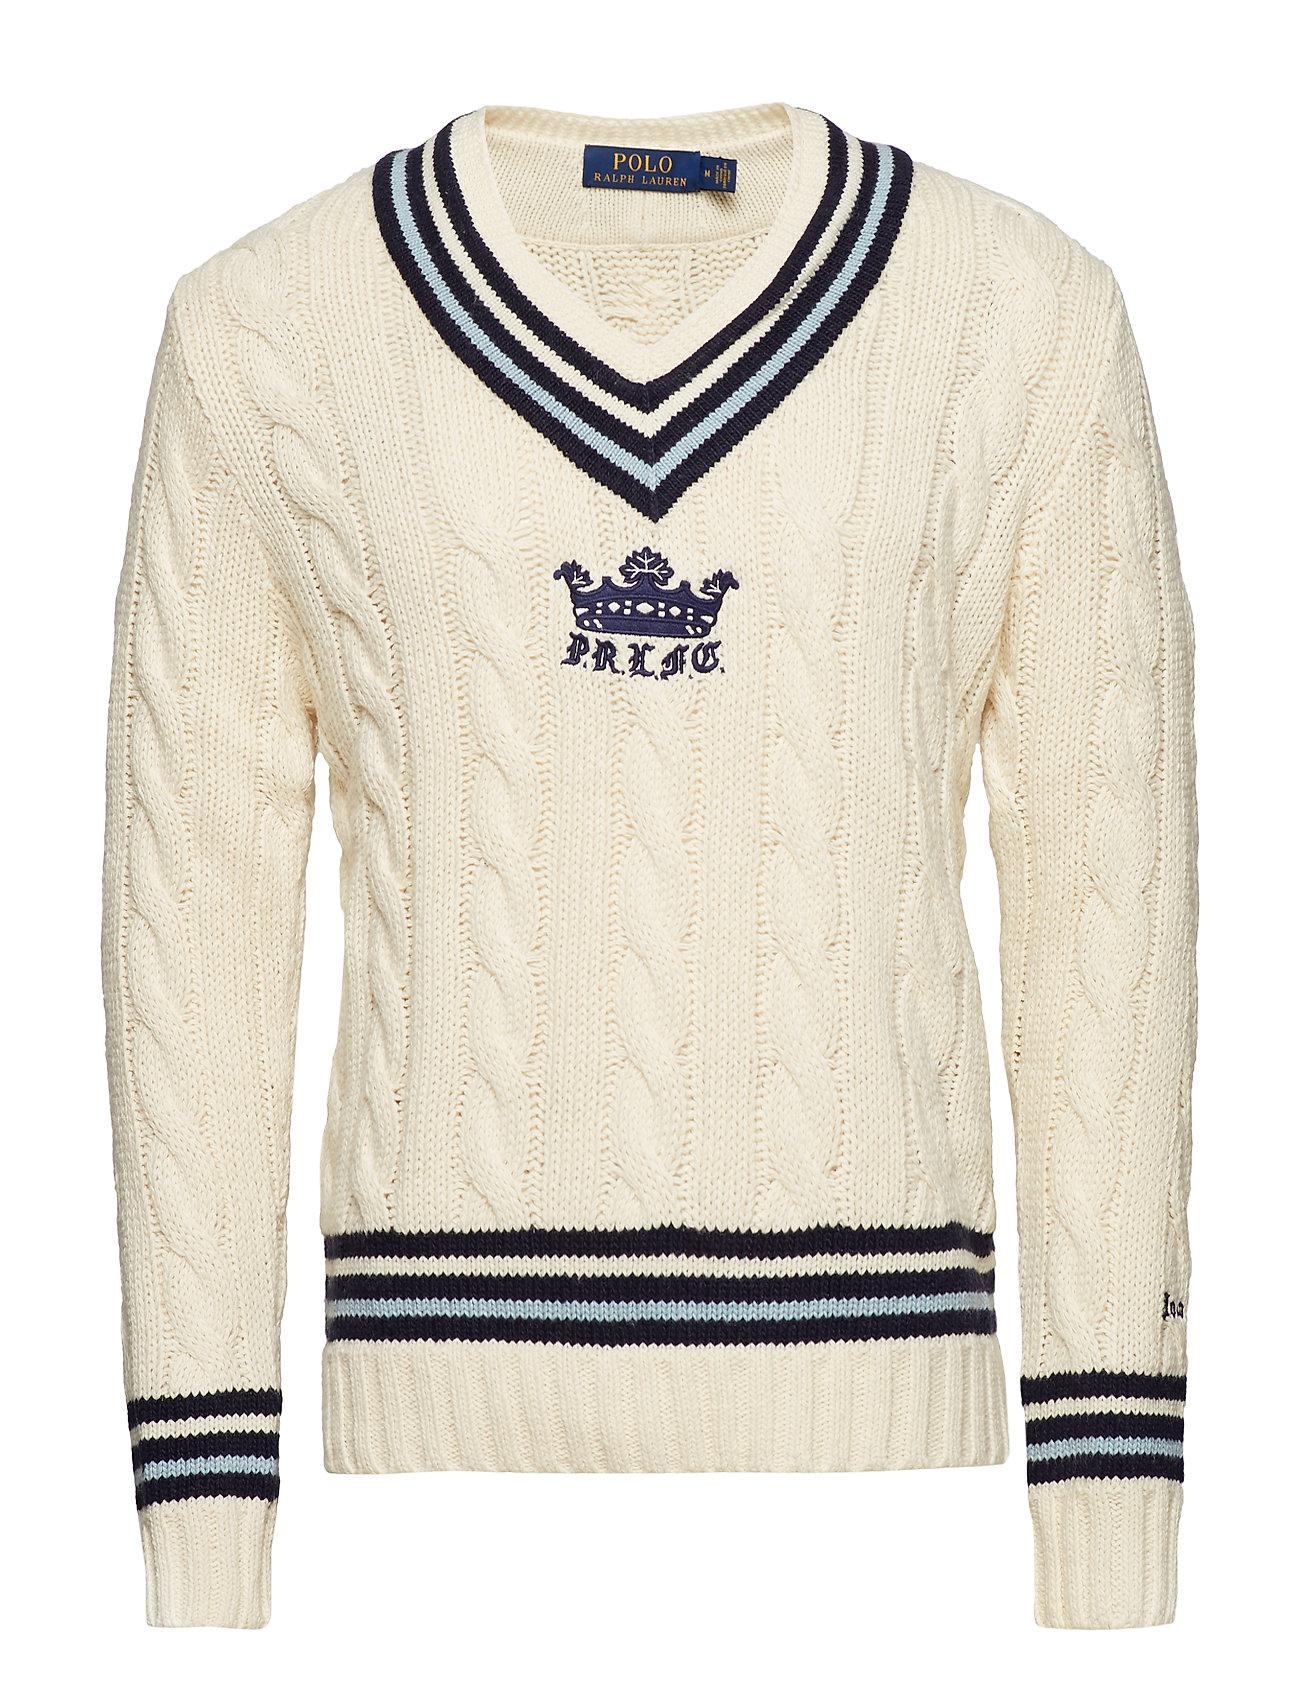 Polo Ralph Lauren Cotton Blend Cricket Sweater Ögrönlar